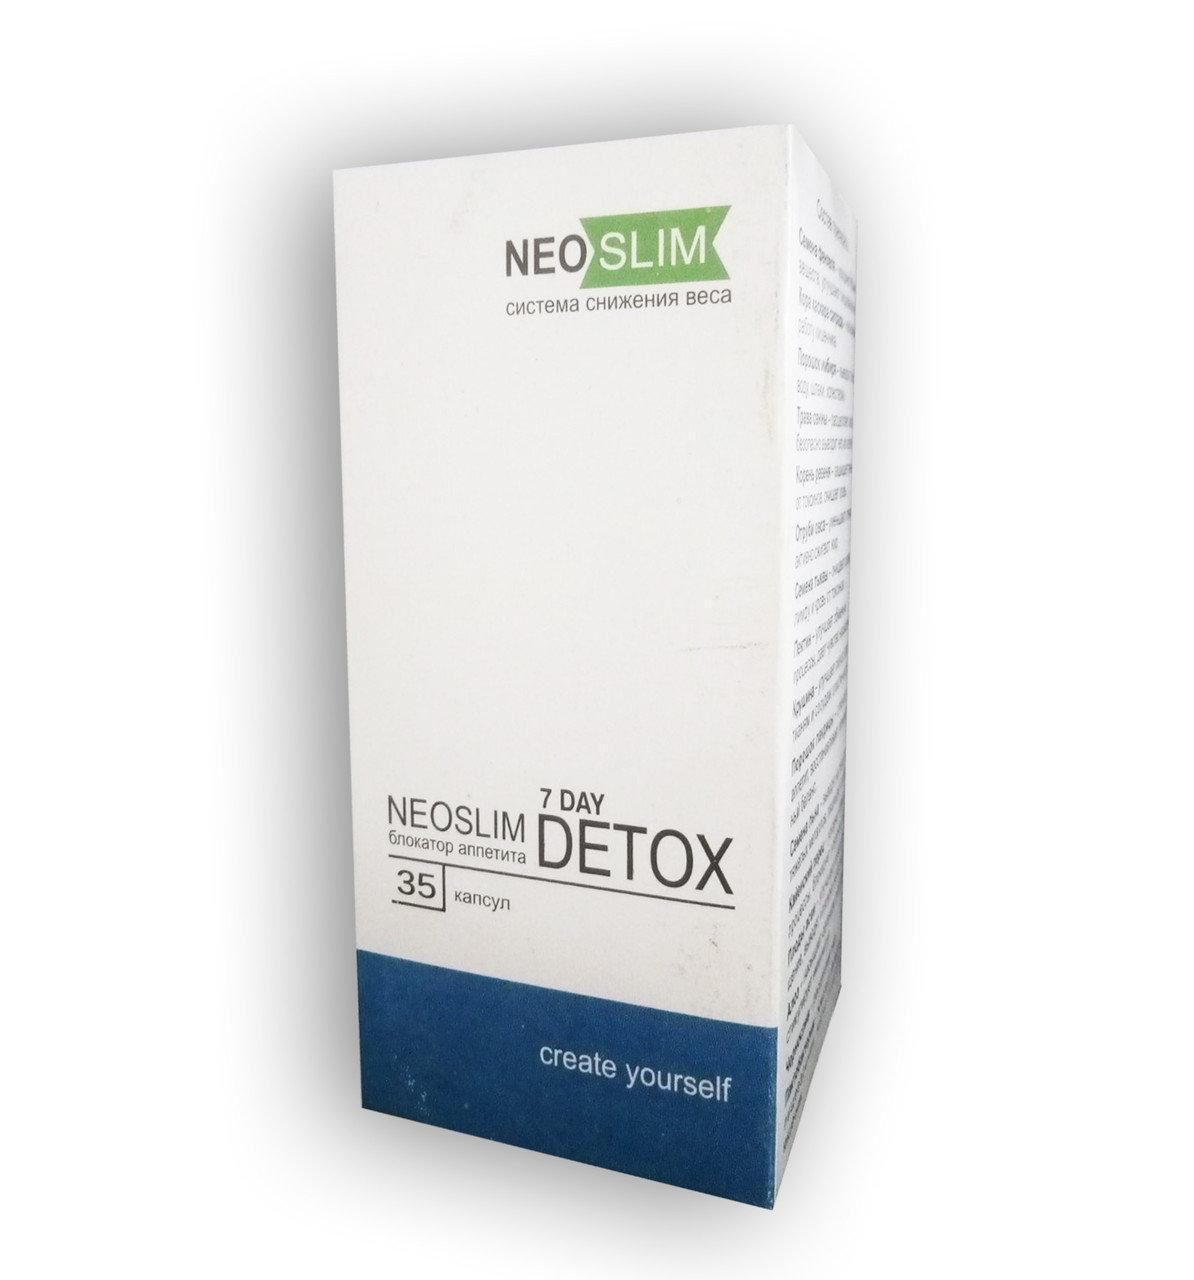 Neo Slim 7 Day Detox (35)- Комплекс для снижения веса (Нео Слим Севен Дей Детокс)